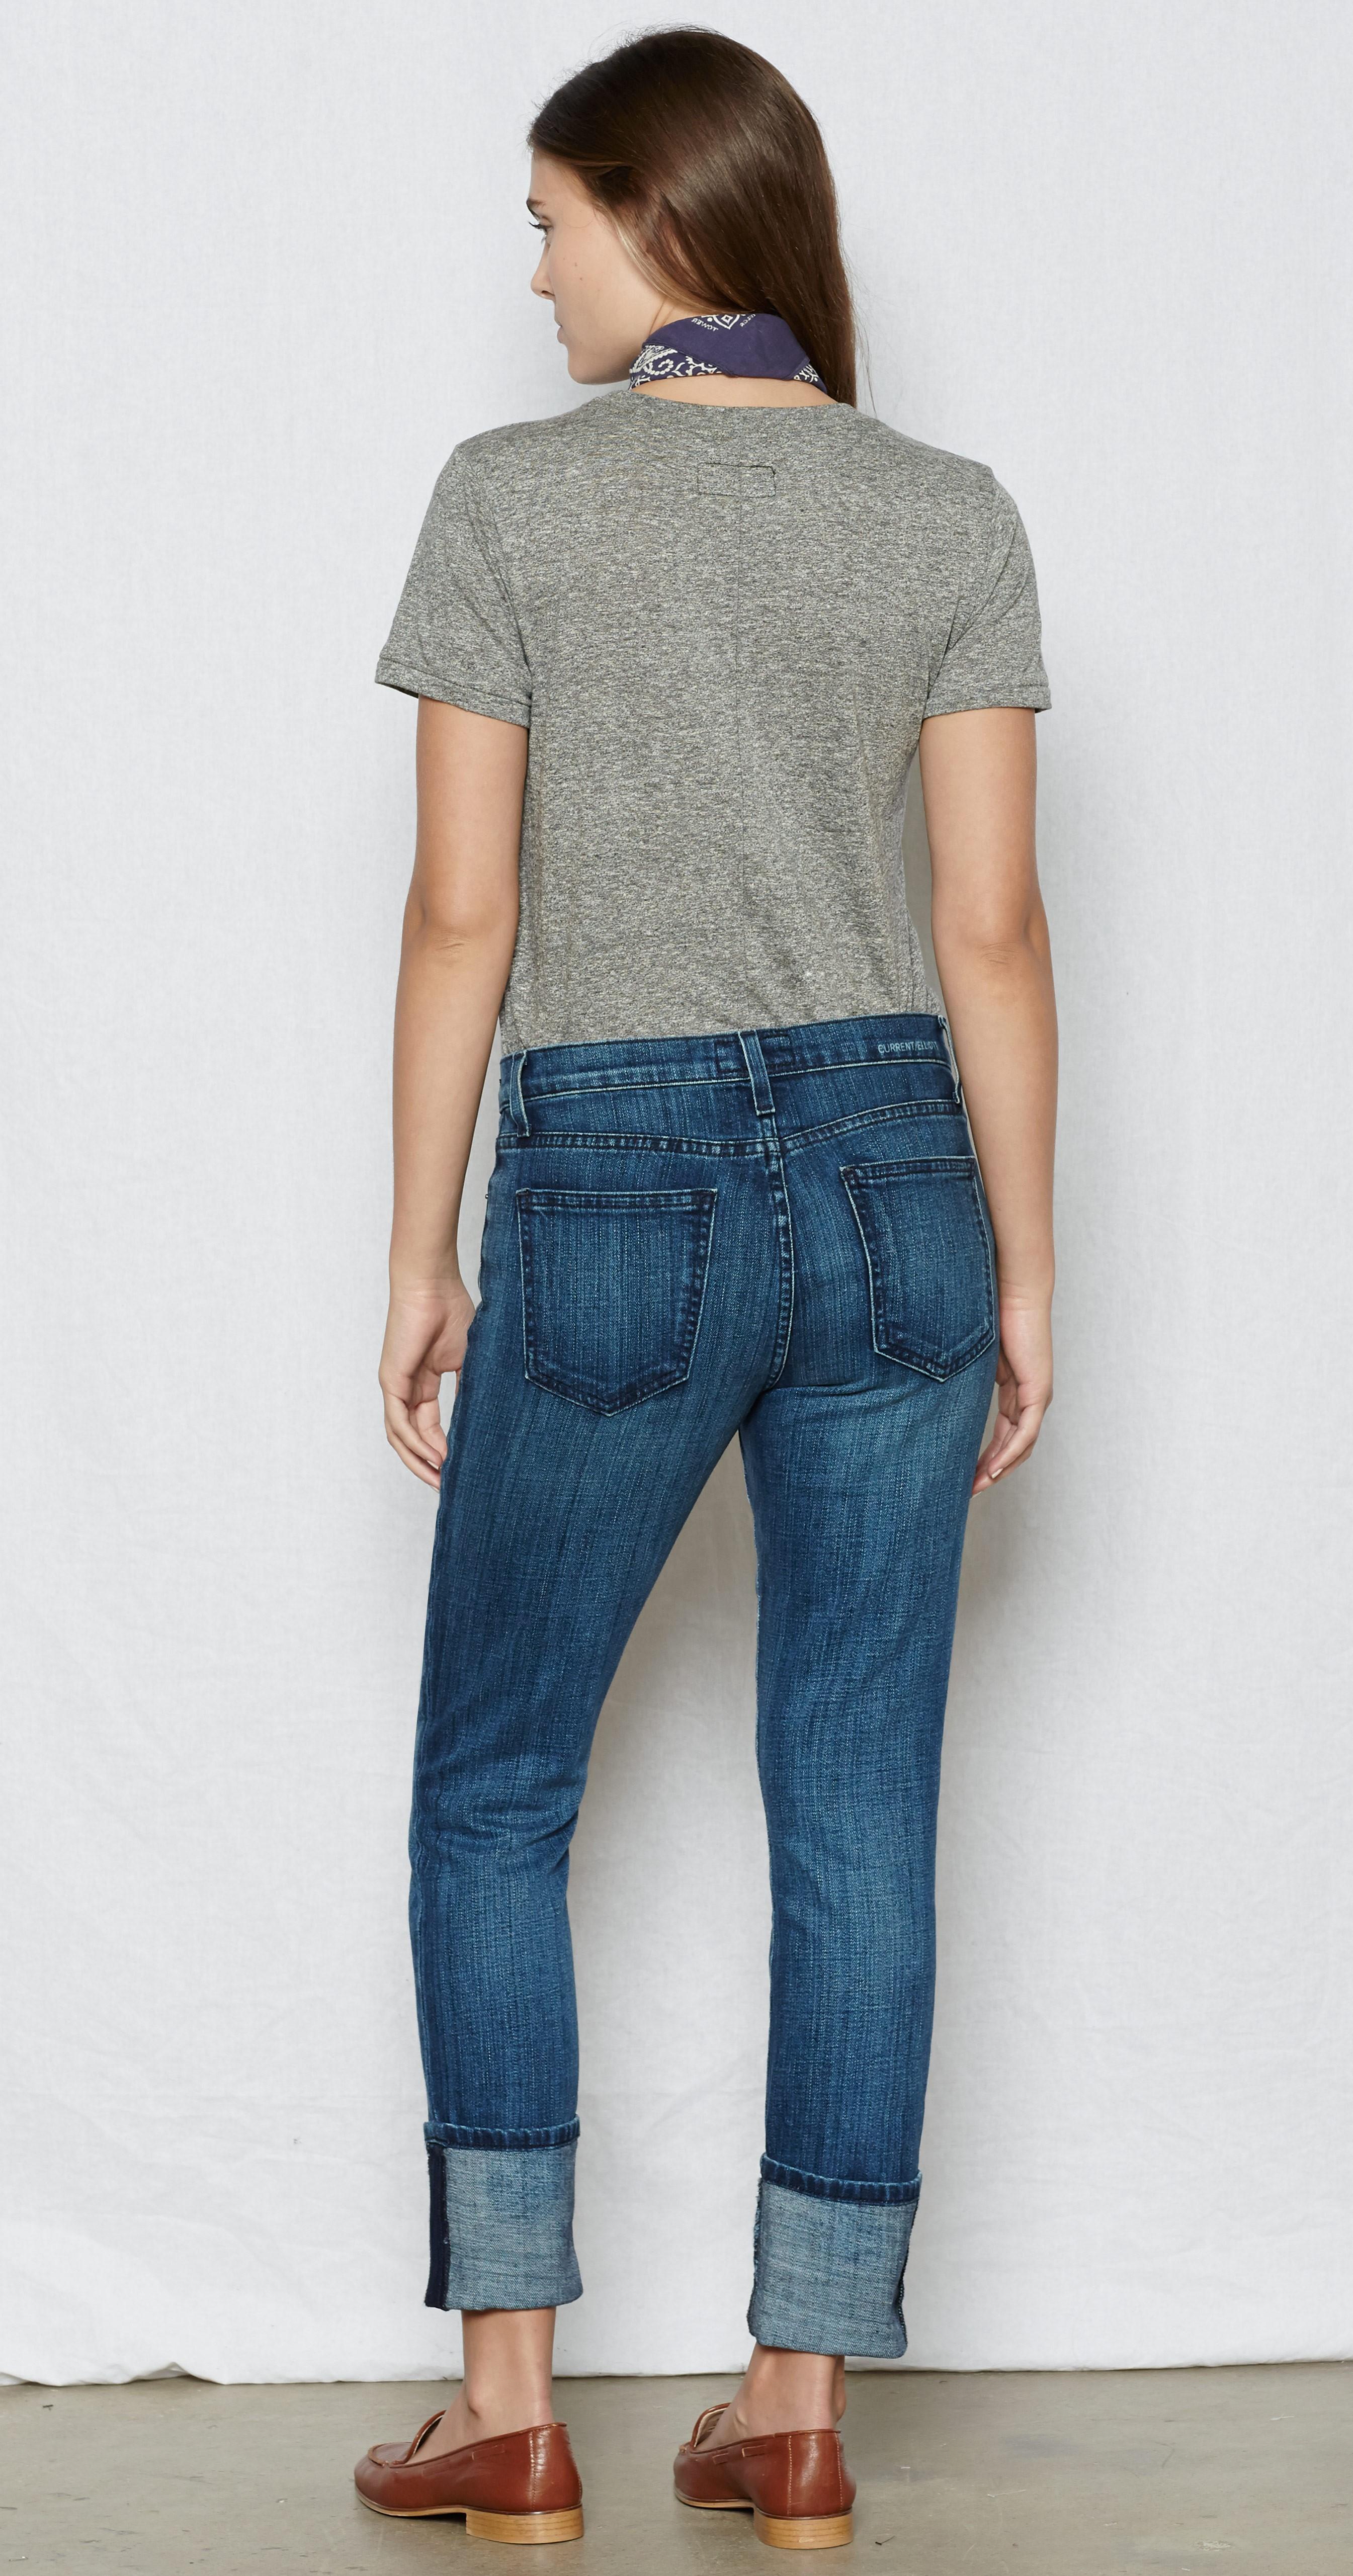 cuffed skinny jeans - Blue Current Elliott xNl19dg4